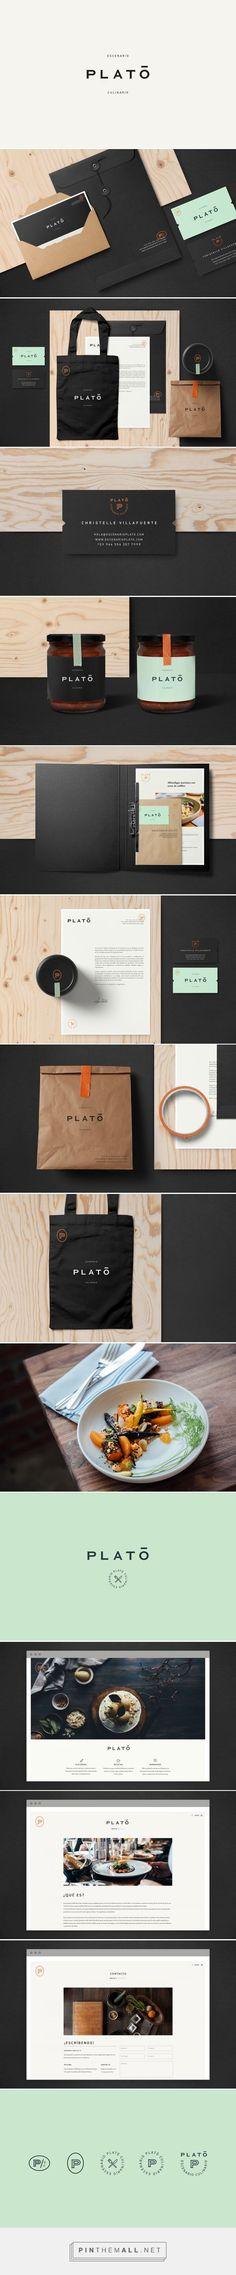 Plató Foodie Lifestyle Branding by Treceveinte | Fivestar Branding Agency – Design and Branding Agency & Curated Inspiration Gallery